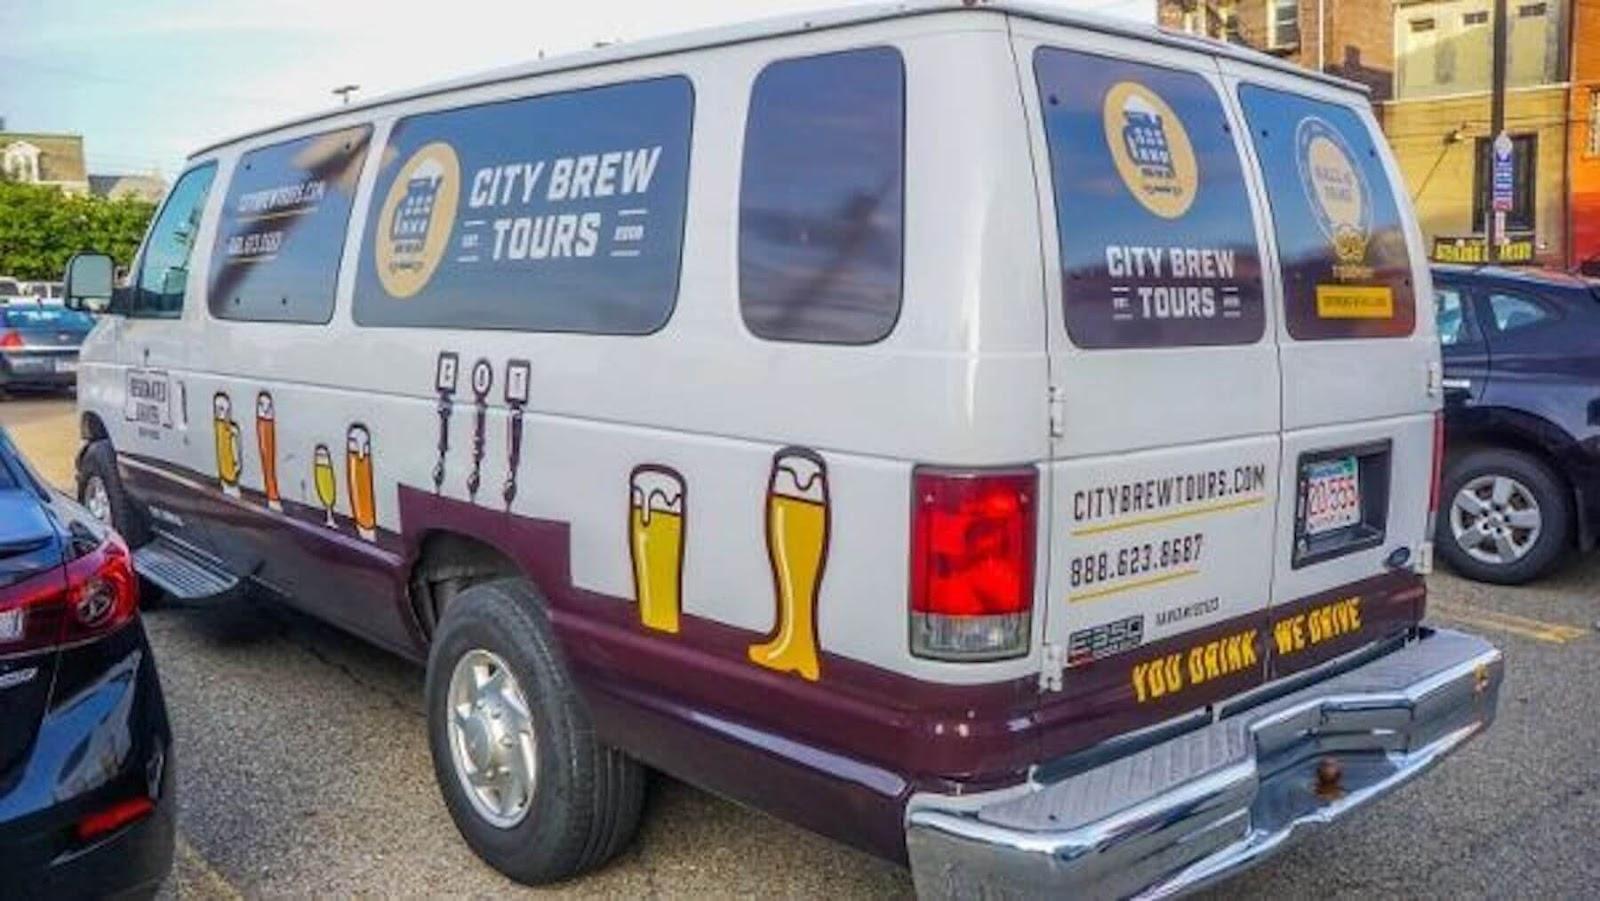 city brew tours van